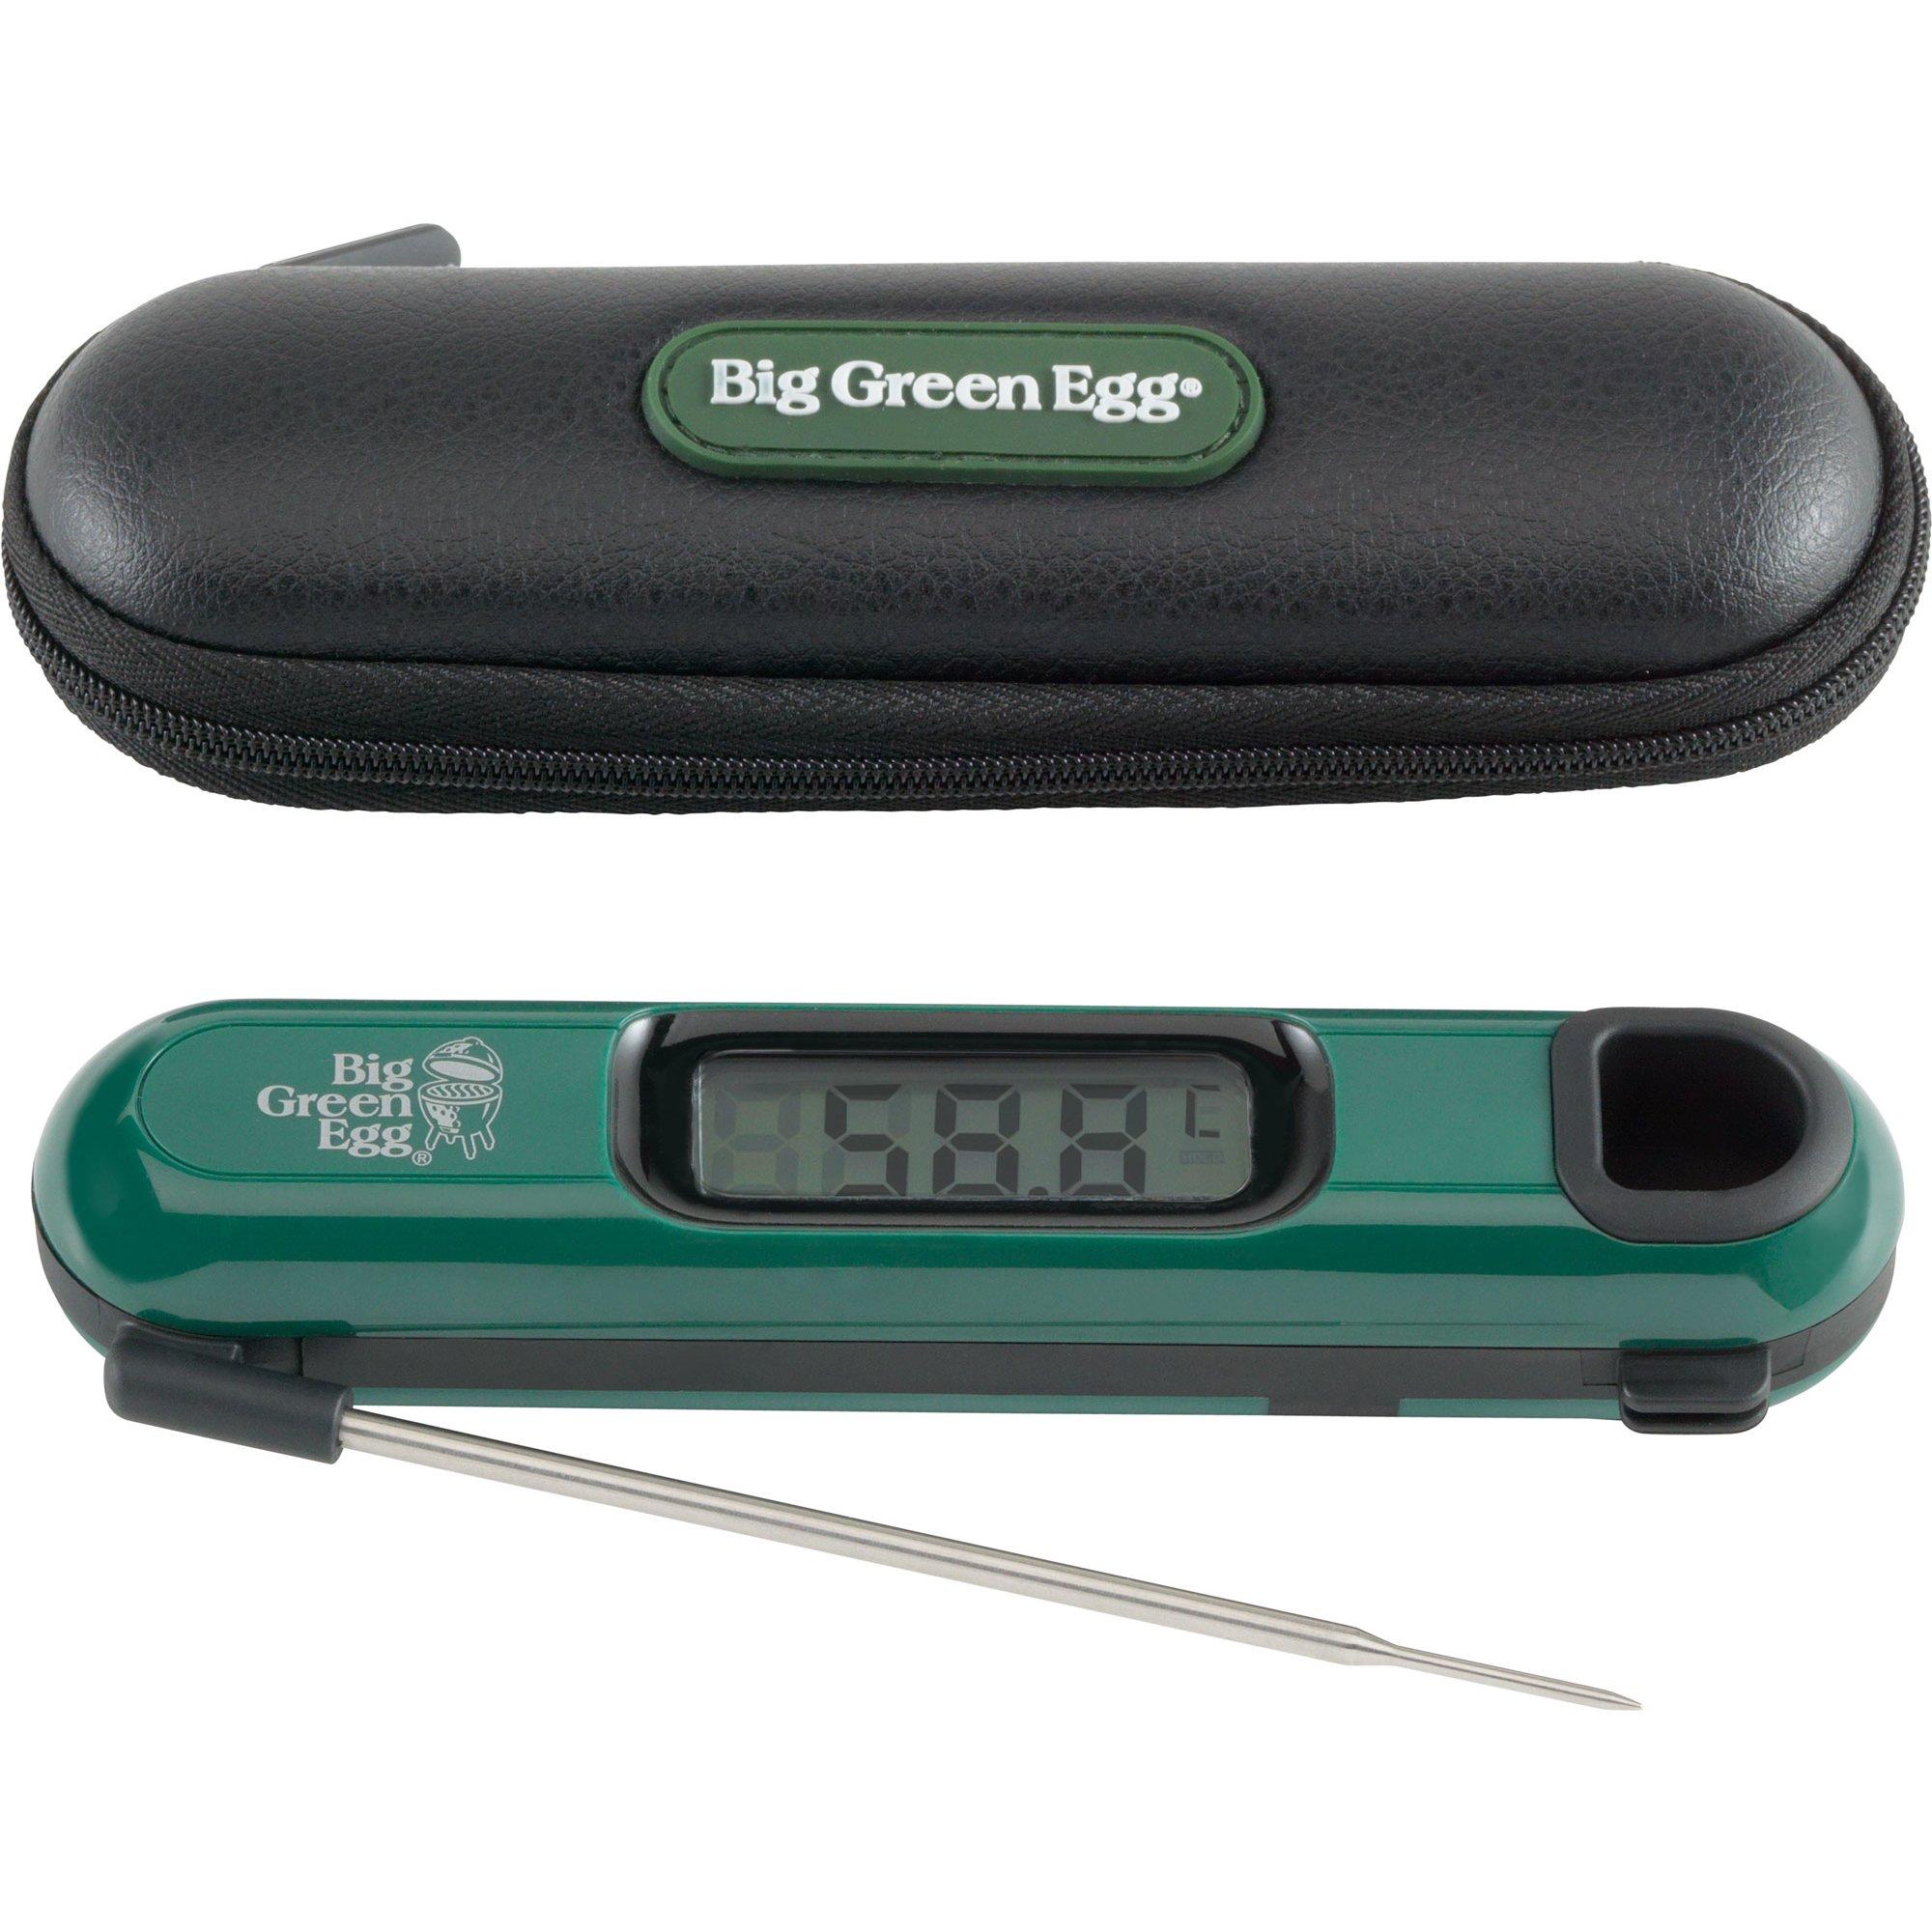 Big Green Egg Instant Read grilltermometer